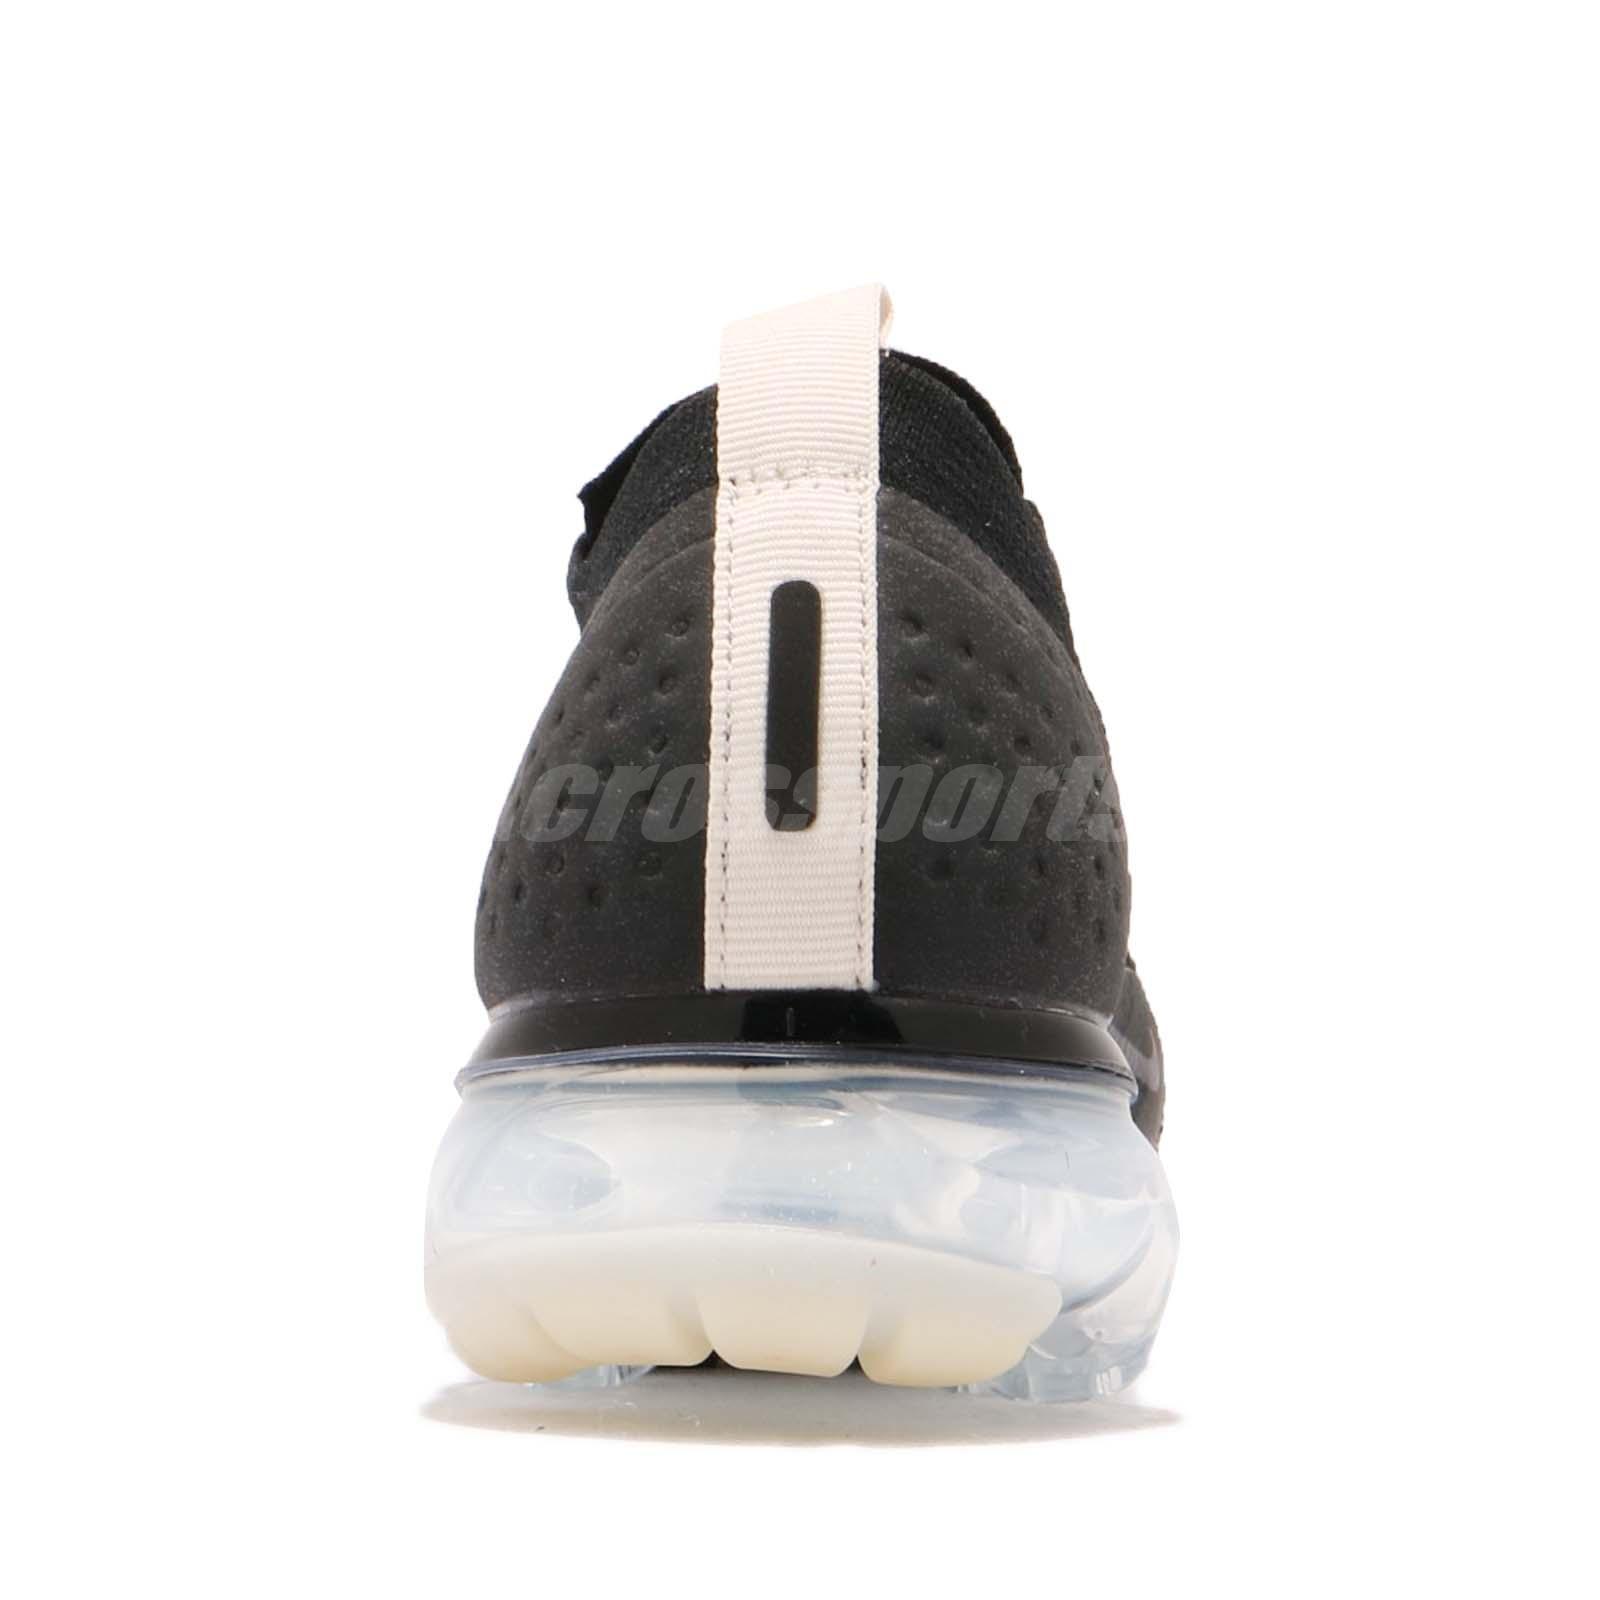 e74a4f1c7b29 Nike Nike Air Vapormax FK Moc 2 Flyknit II Black Light Cream Men Running  AH7006-002